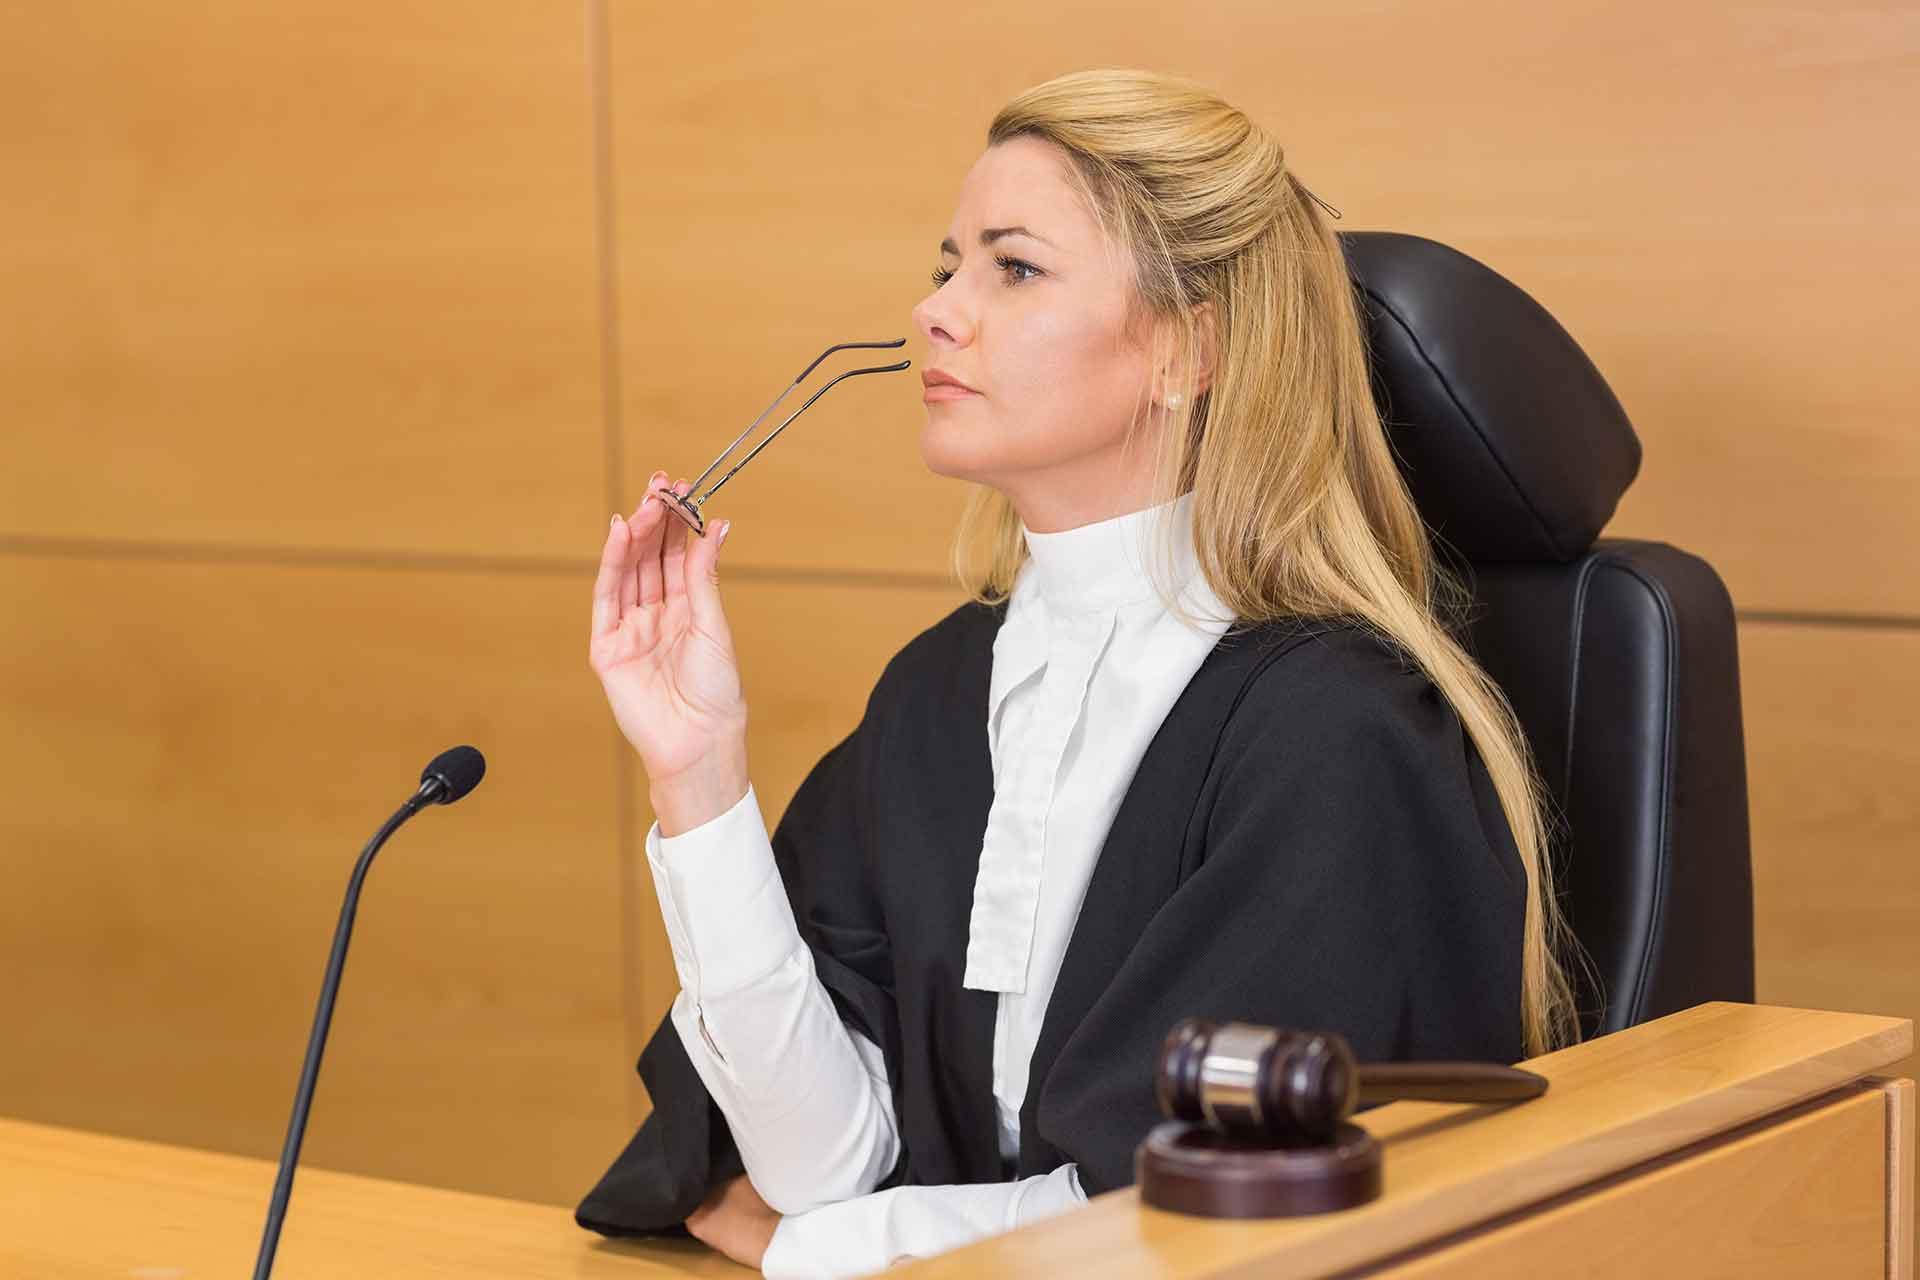 Kantonrechter strafrecht advocaat - Weening Strafrechtadvocaten